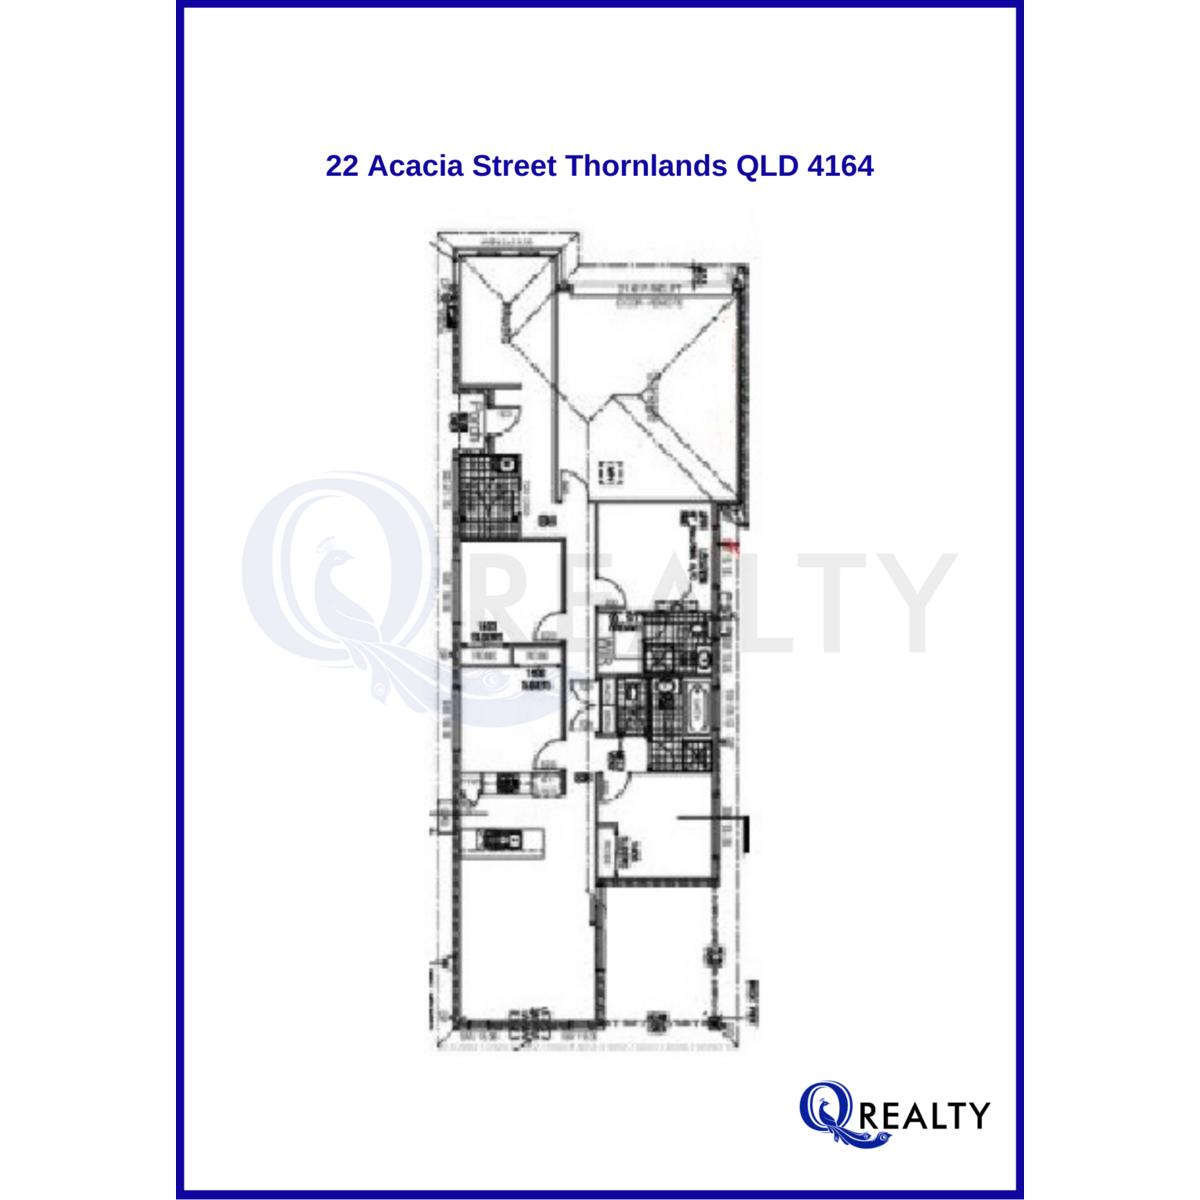 22 Acacia Street, Thornlands  QLD  4164